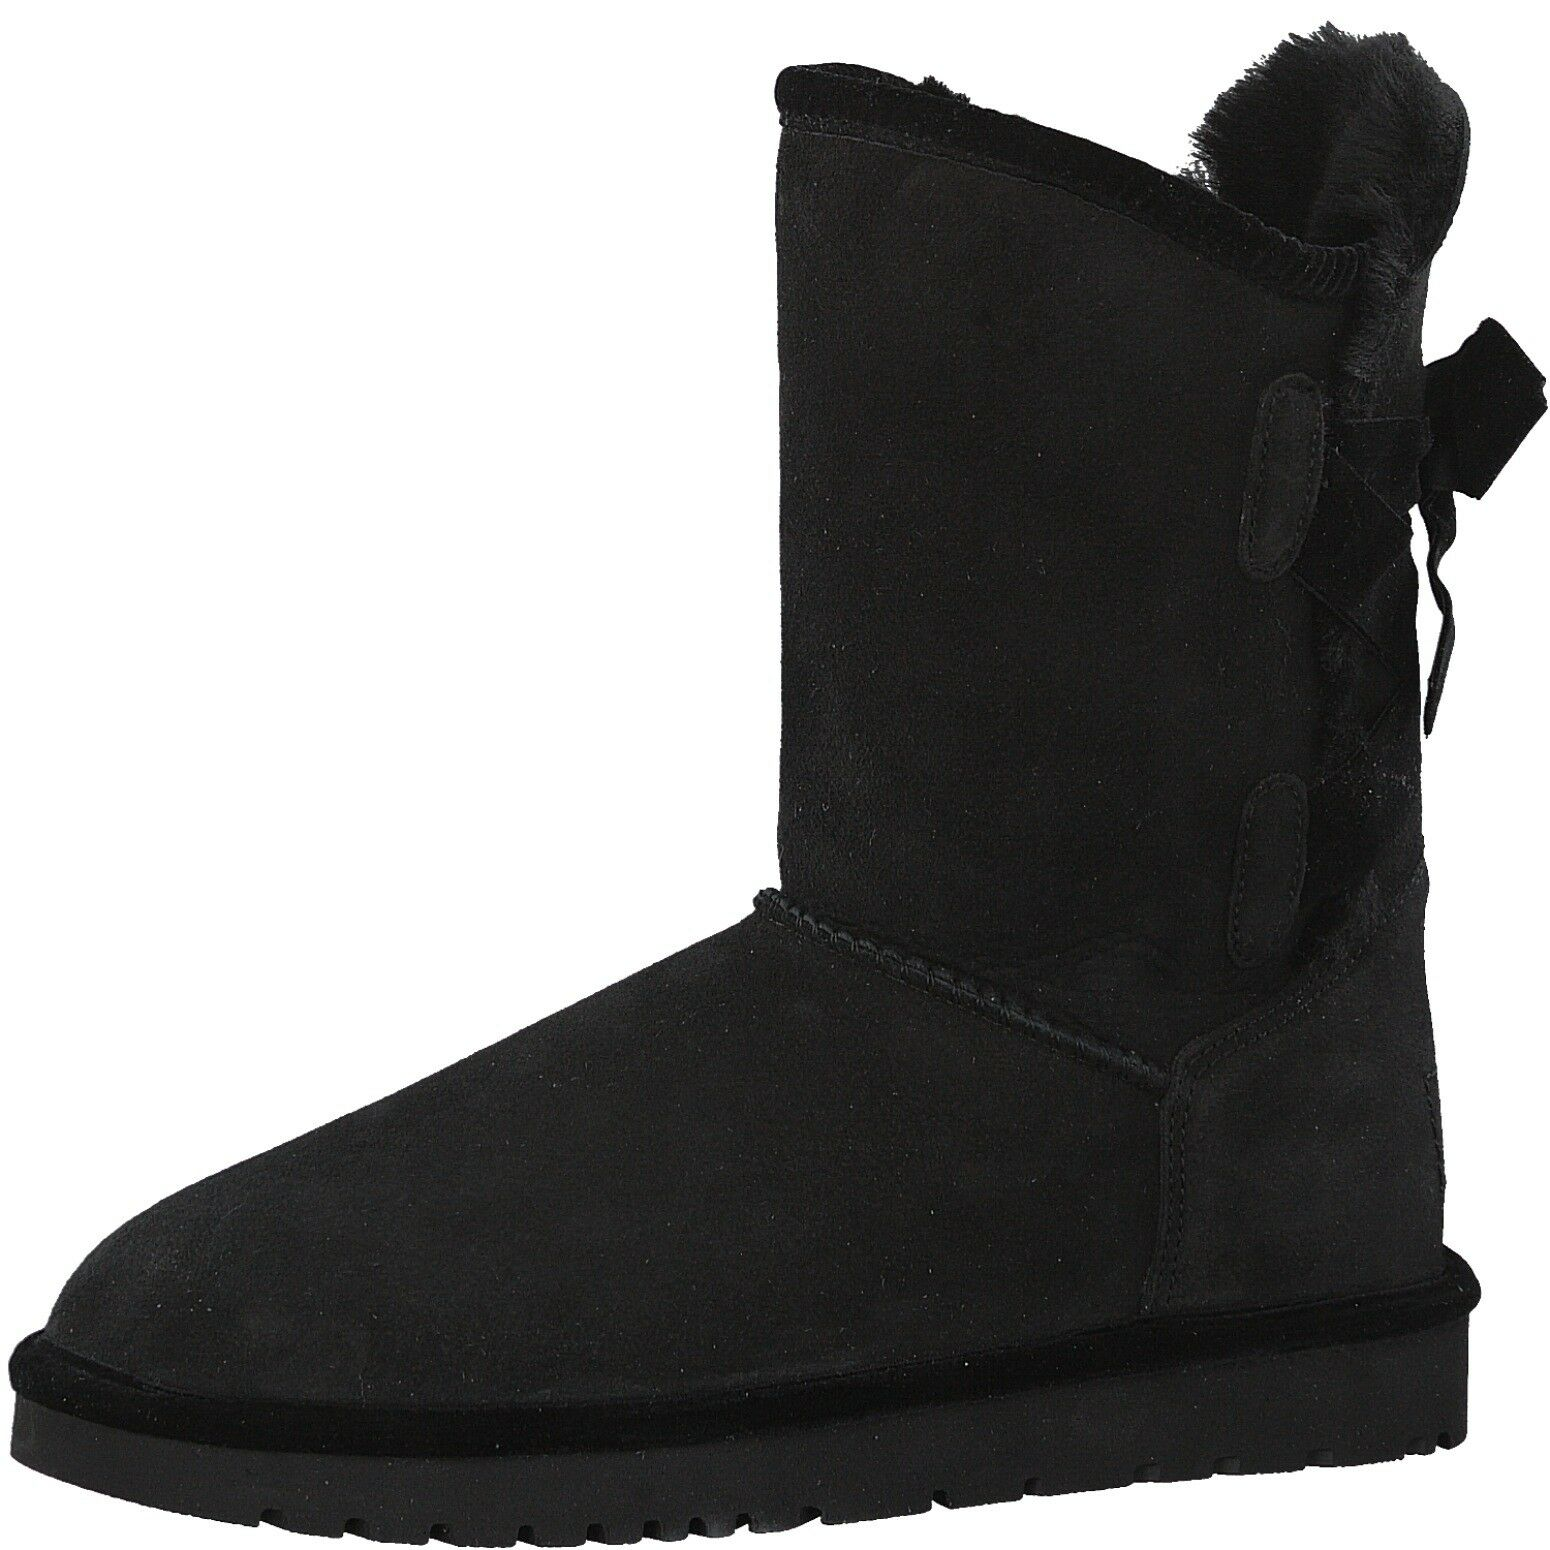 Echt Schwarz Stiefel Winter Tamaris Leder Schuhe FKJcl1